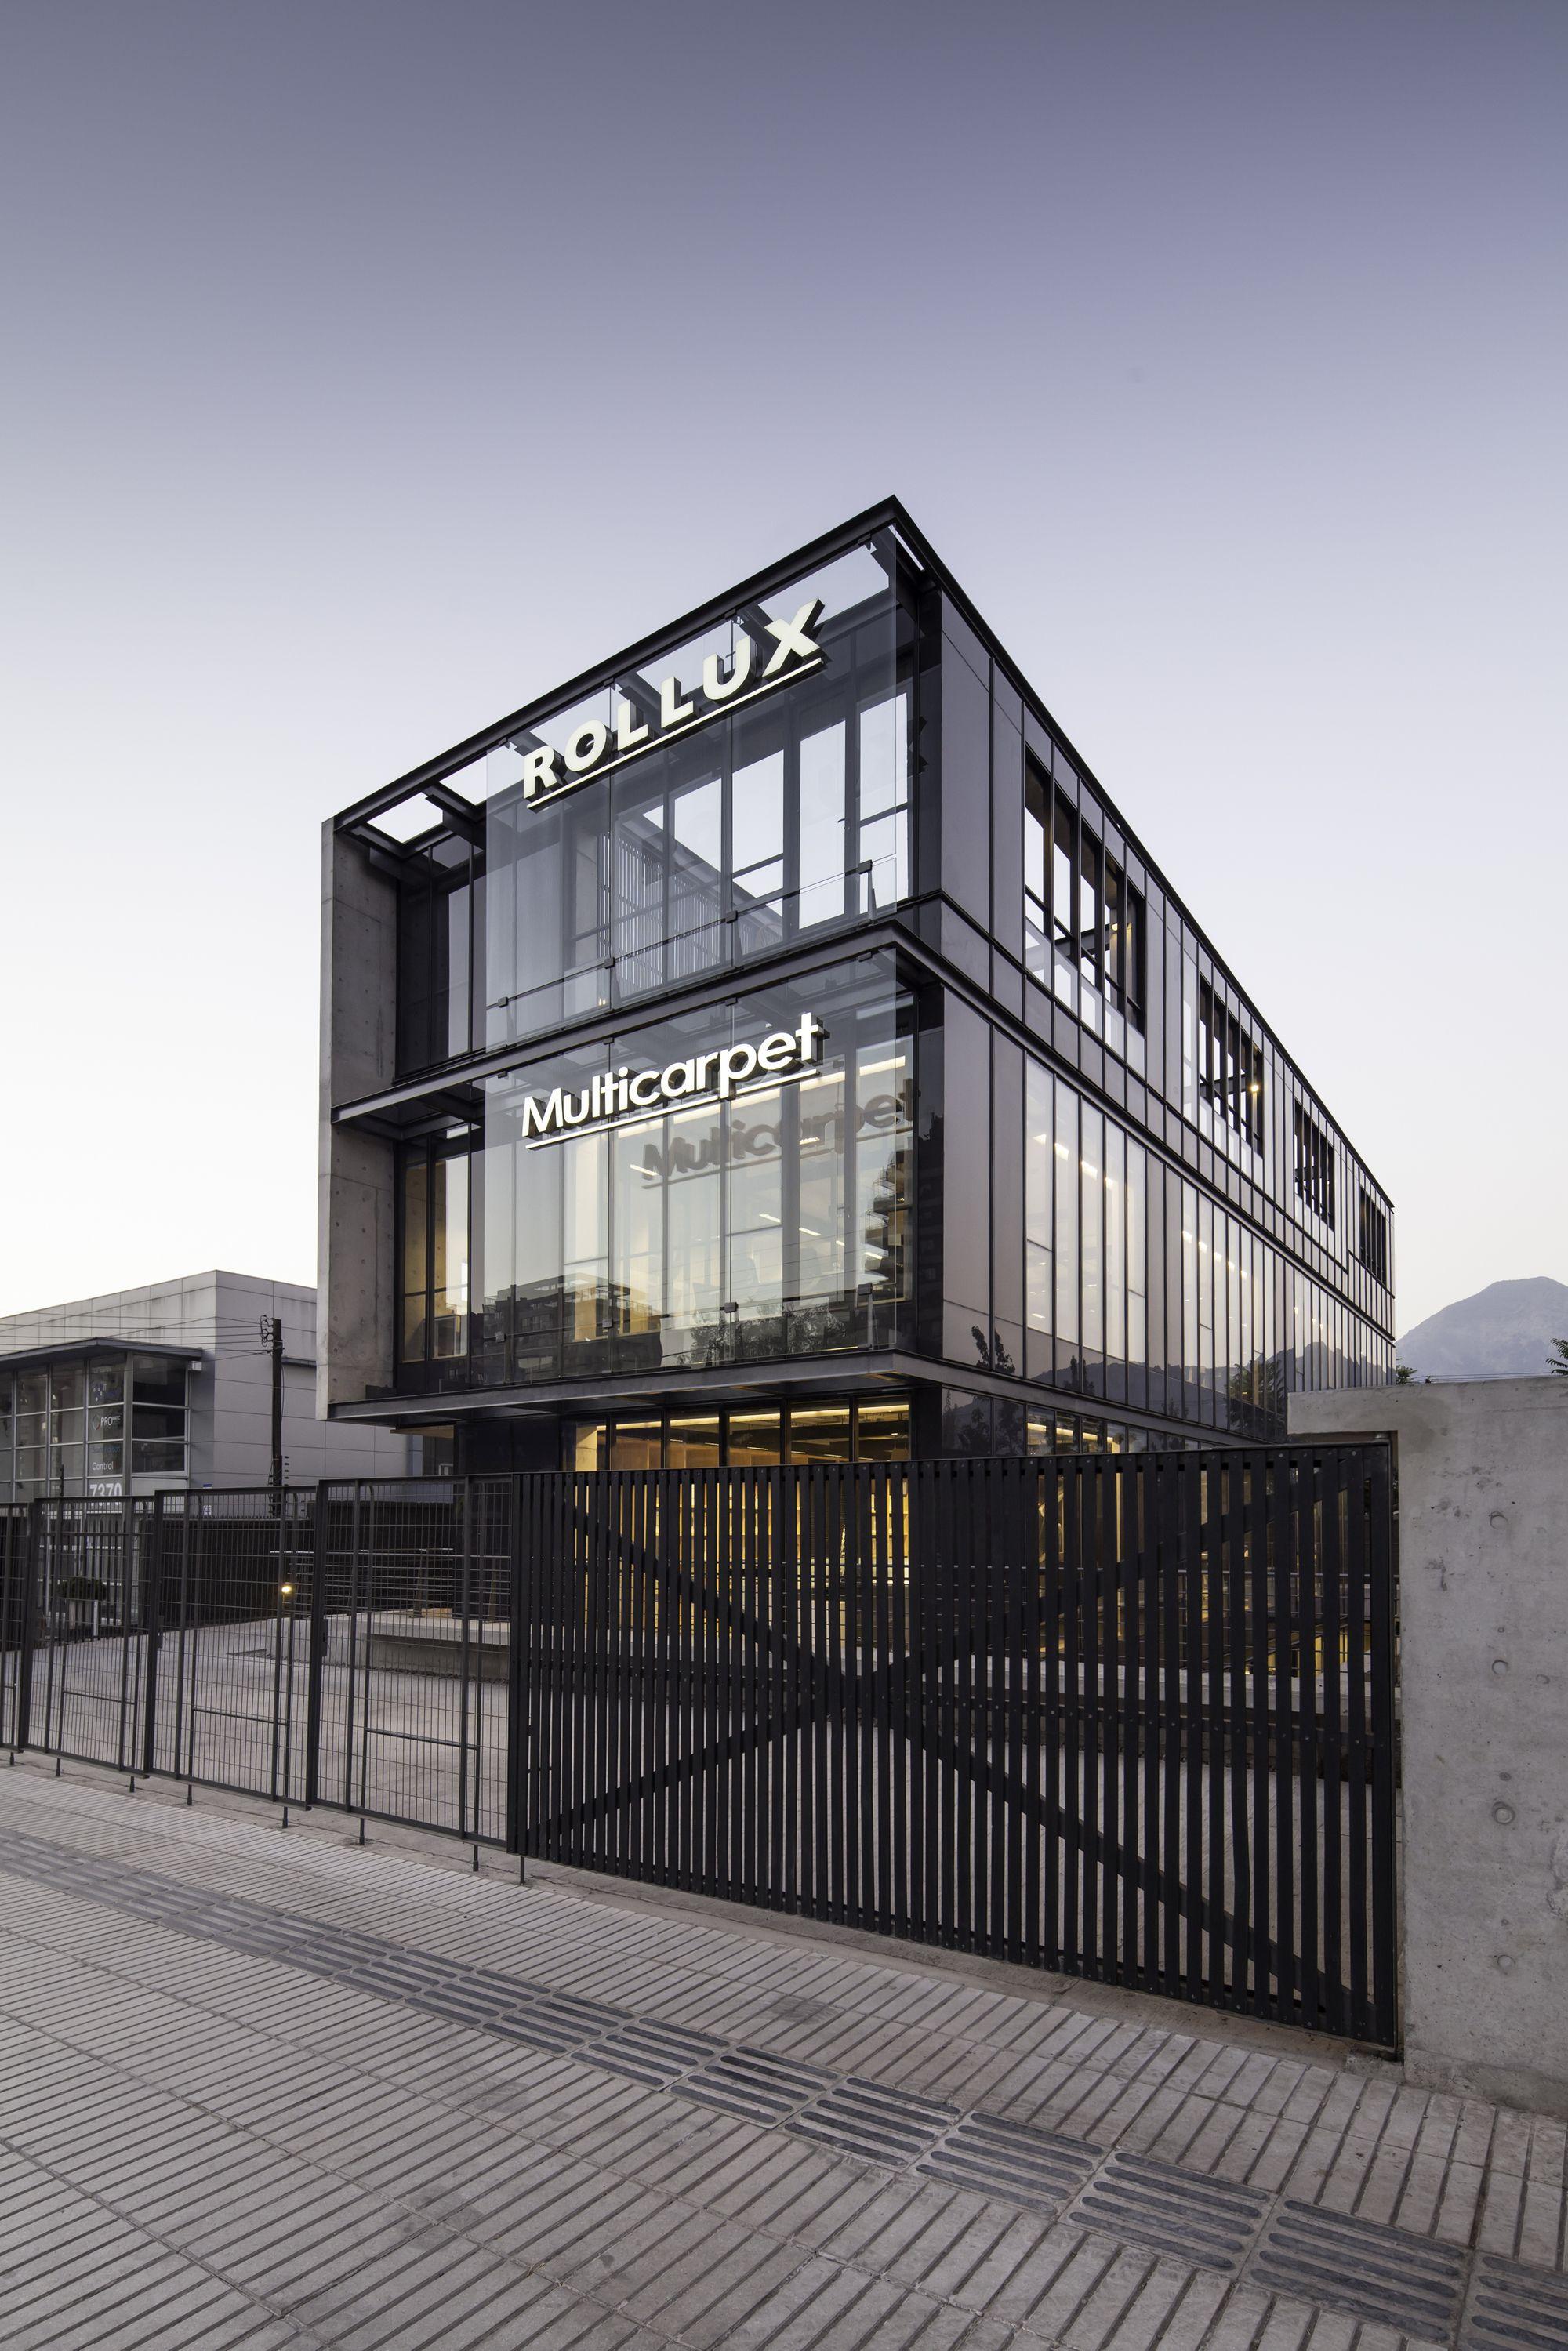 Showroom rollux multicarpet arquitectos architecture pinterest glass building building for Modern showroom exterior design